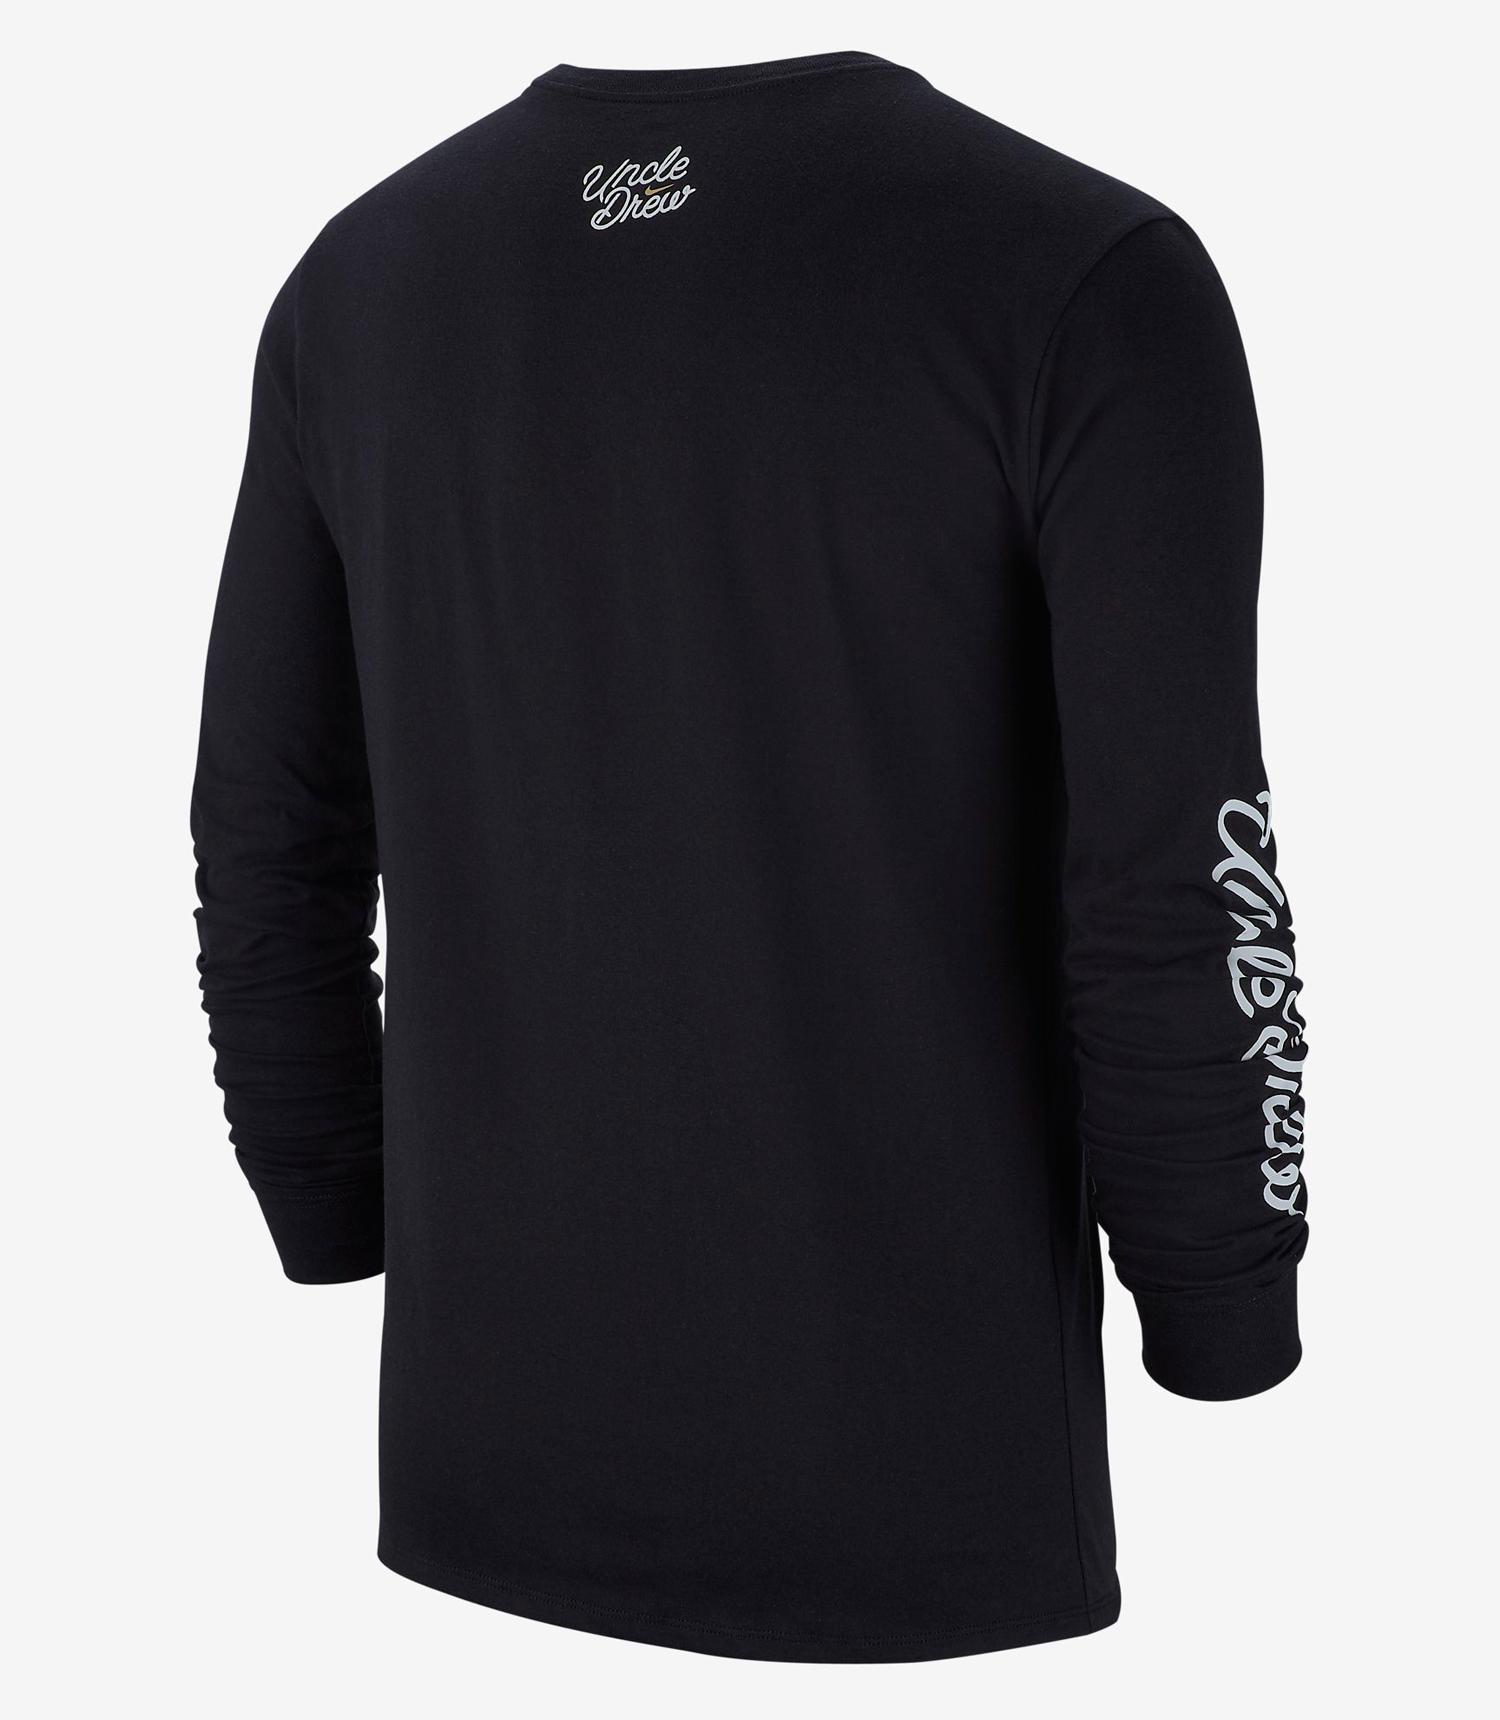 nike-kyrie-4-uncle-drew-long-sleeve-shirt-black-2